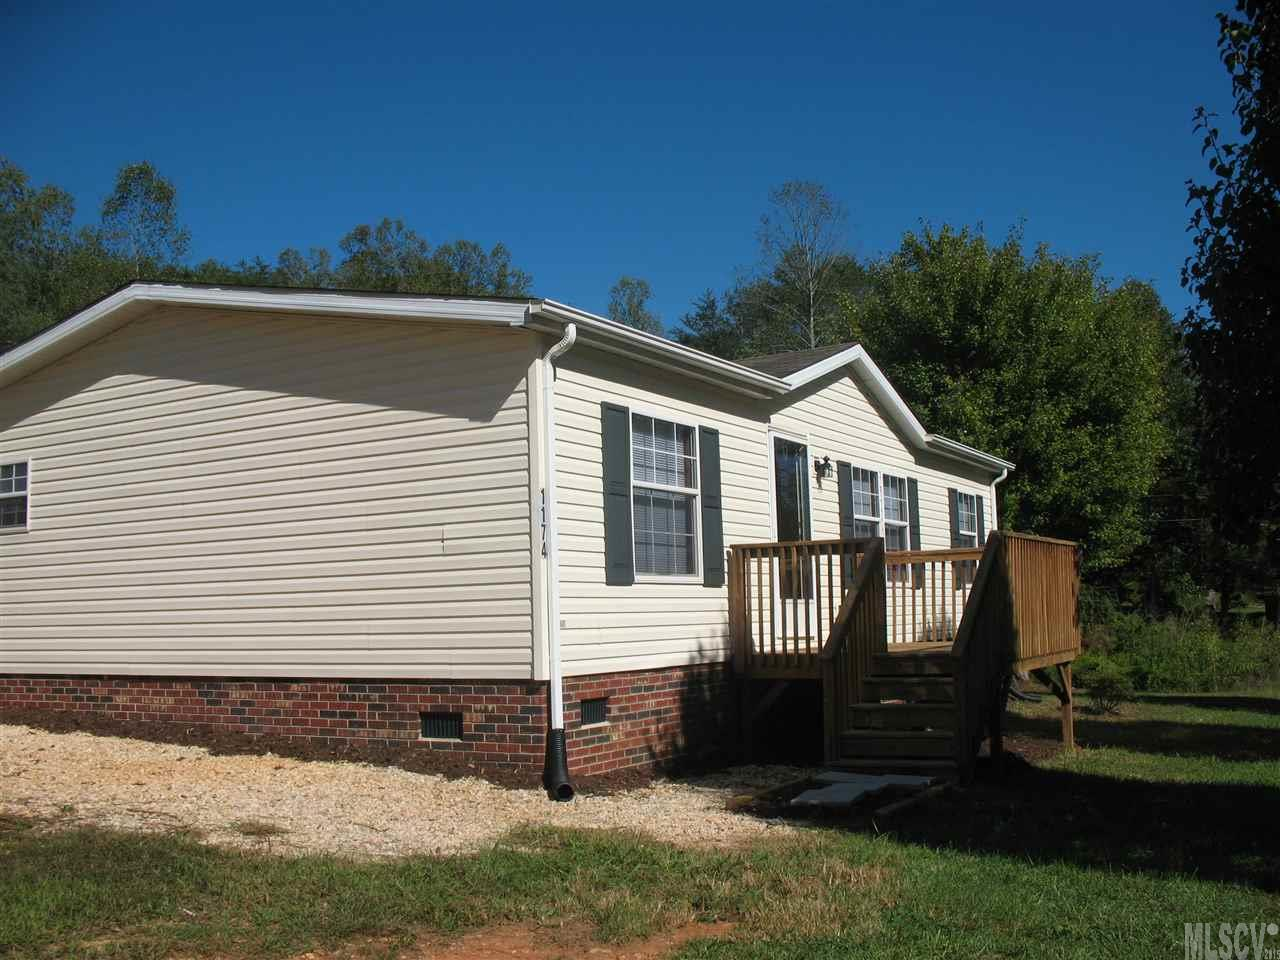 Real Estate for Sale, ListingId: 35382882, Lenoir,NC28645